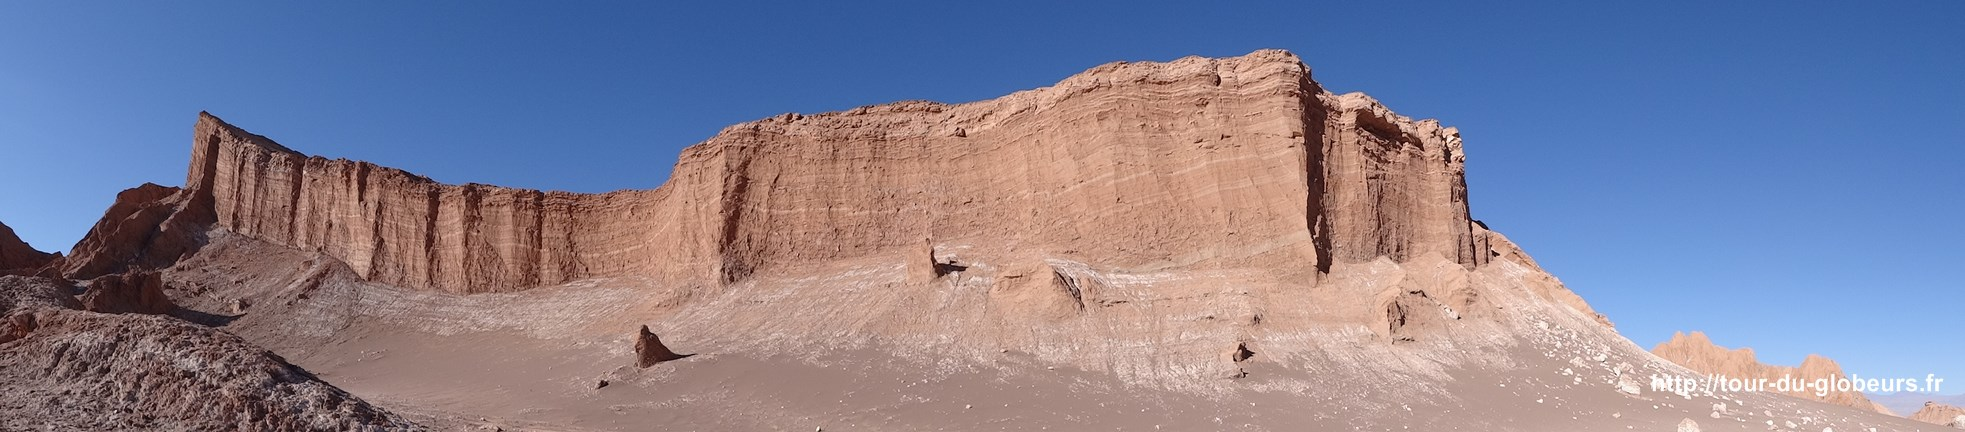 Chili - Atacama - Vallée de la lune